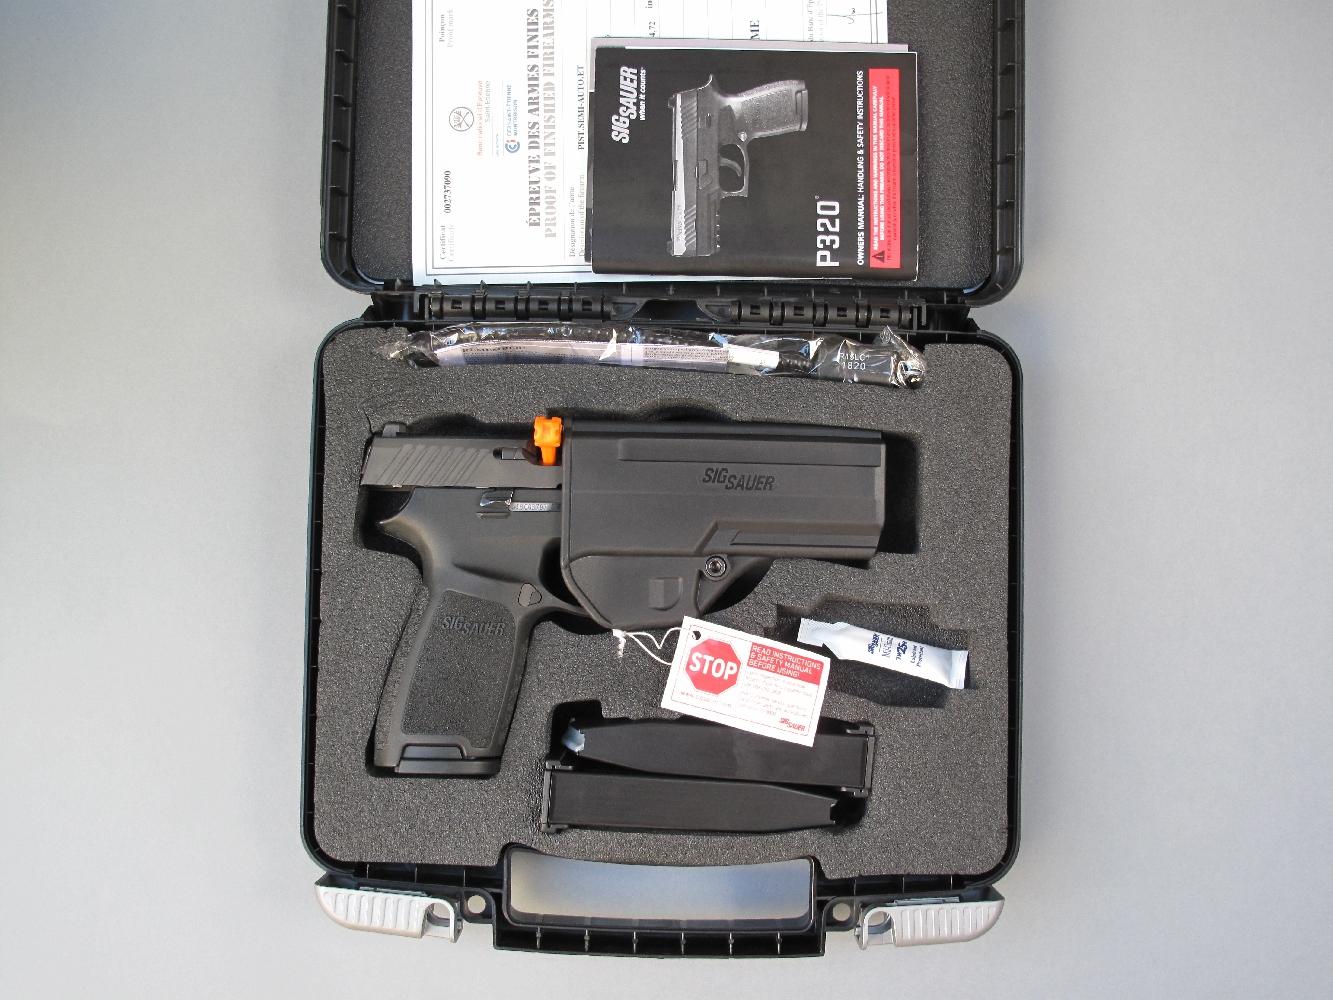 Essai armes pistolets sig sauer p320 full size et for Temoin chambre vide sig sauer